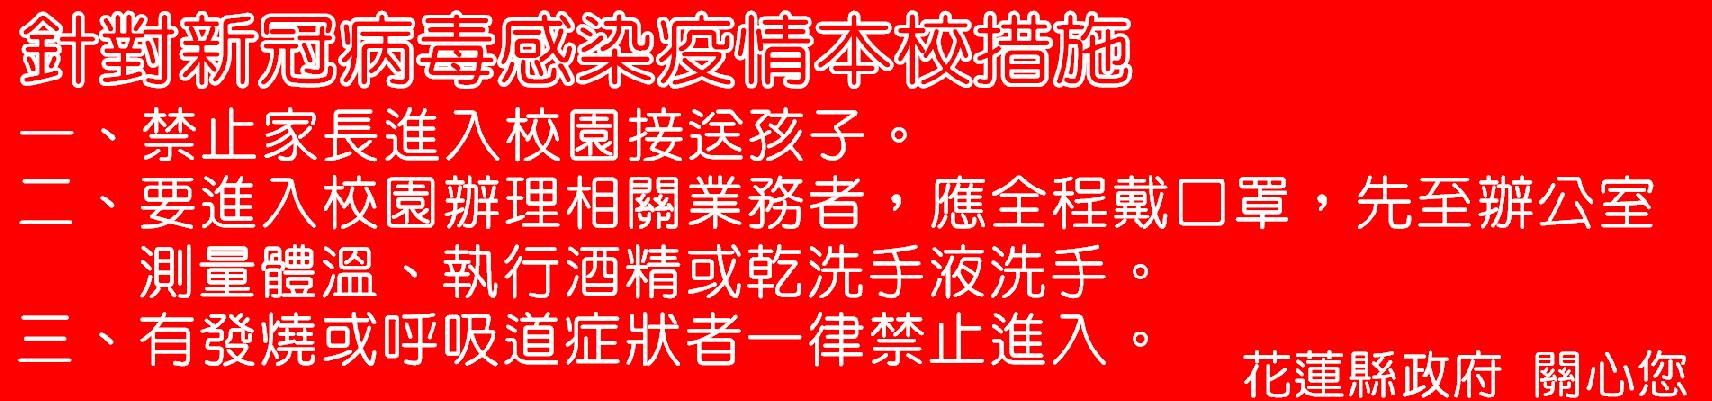 slider image 270